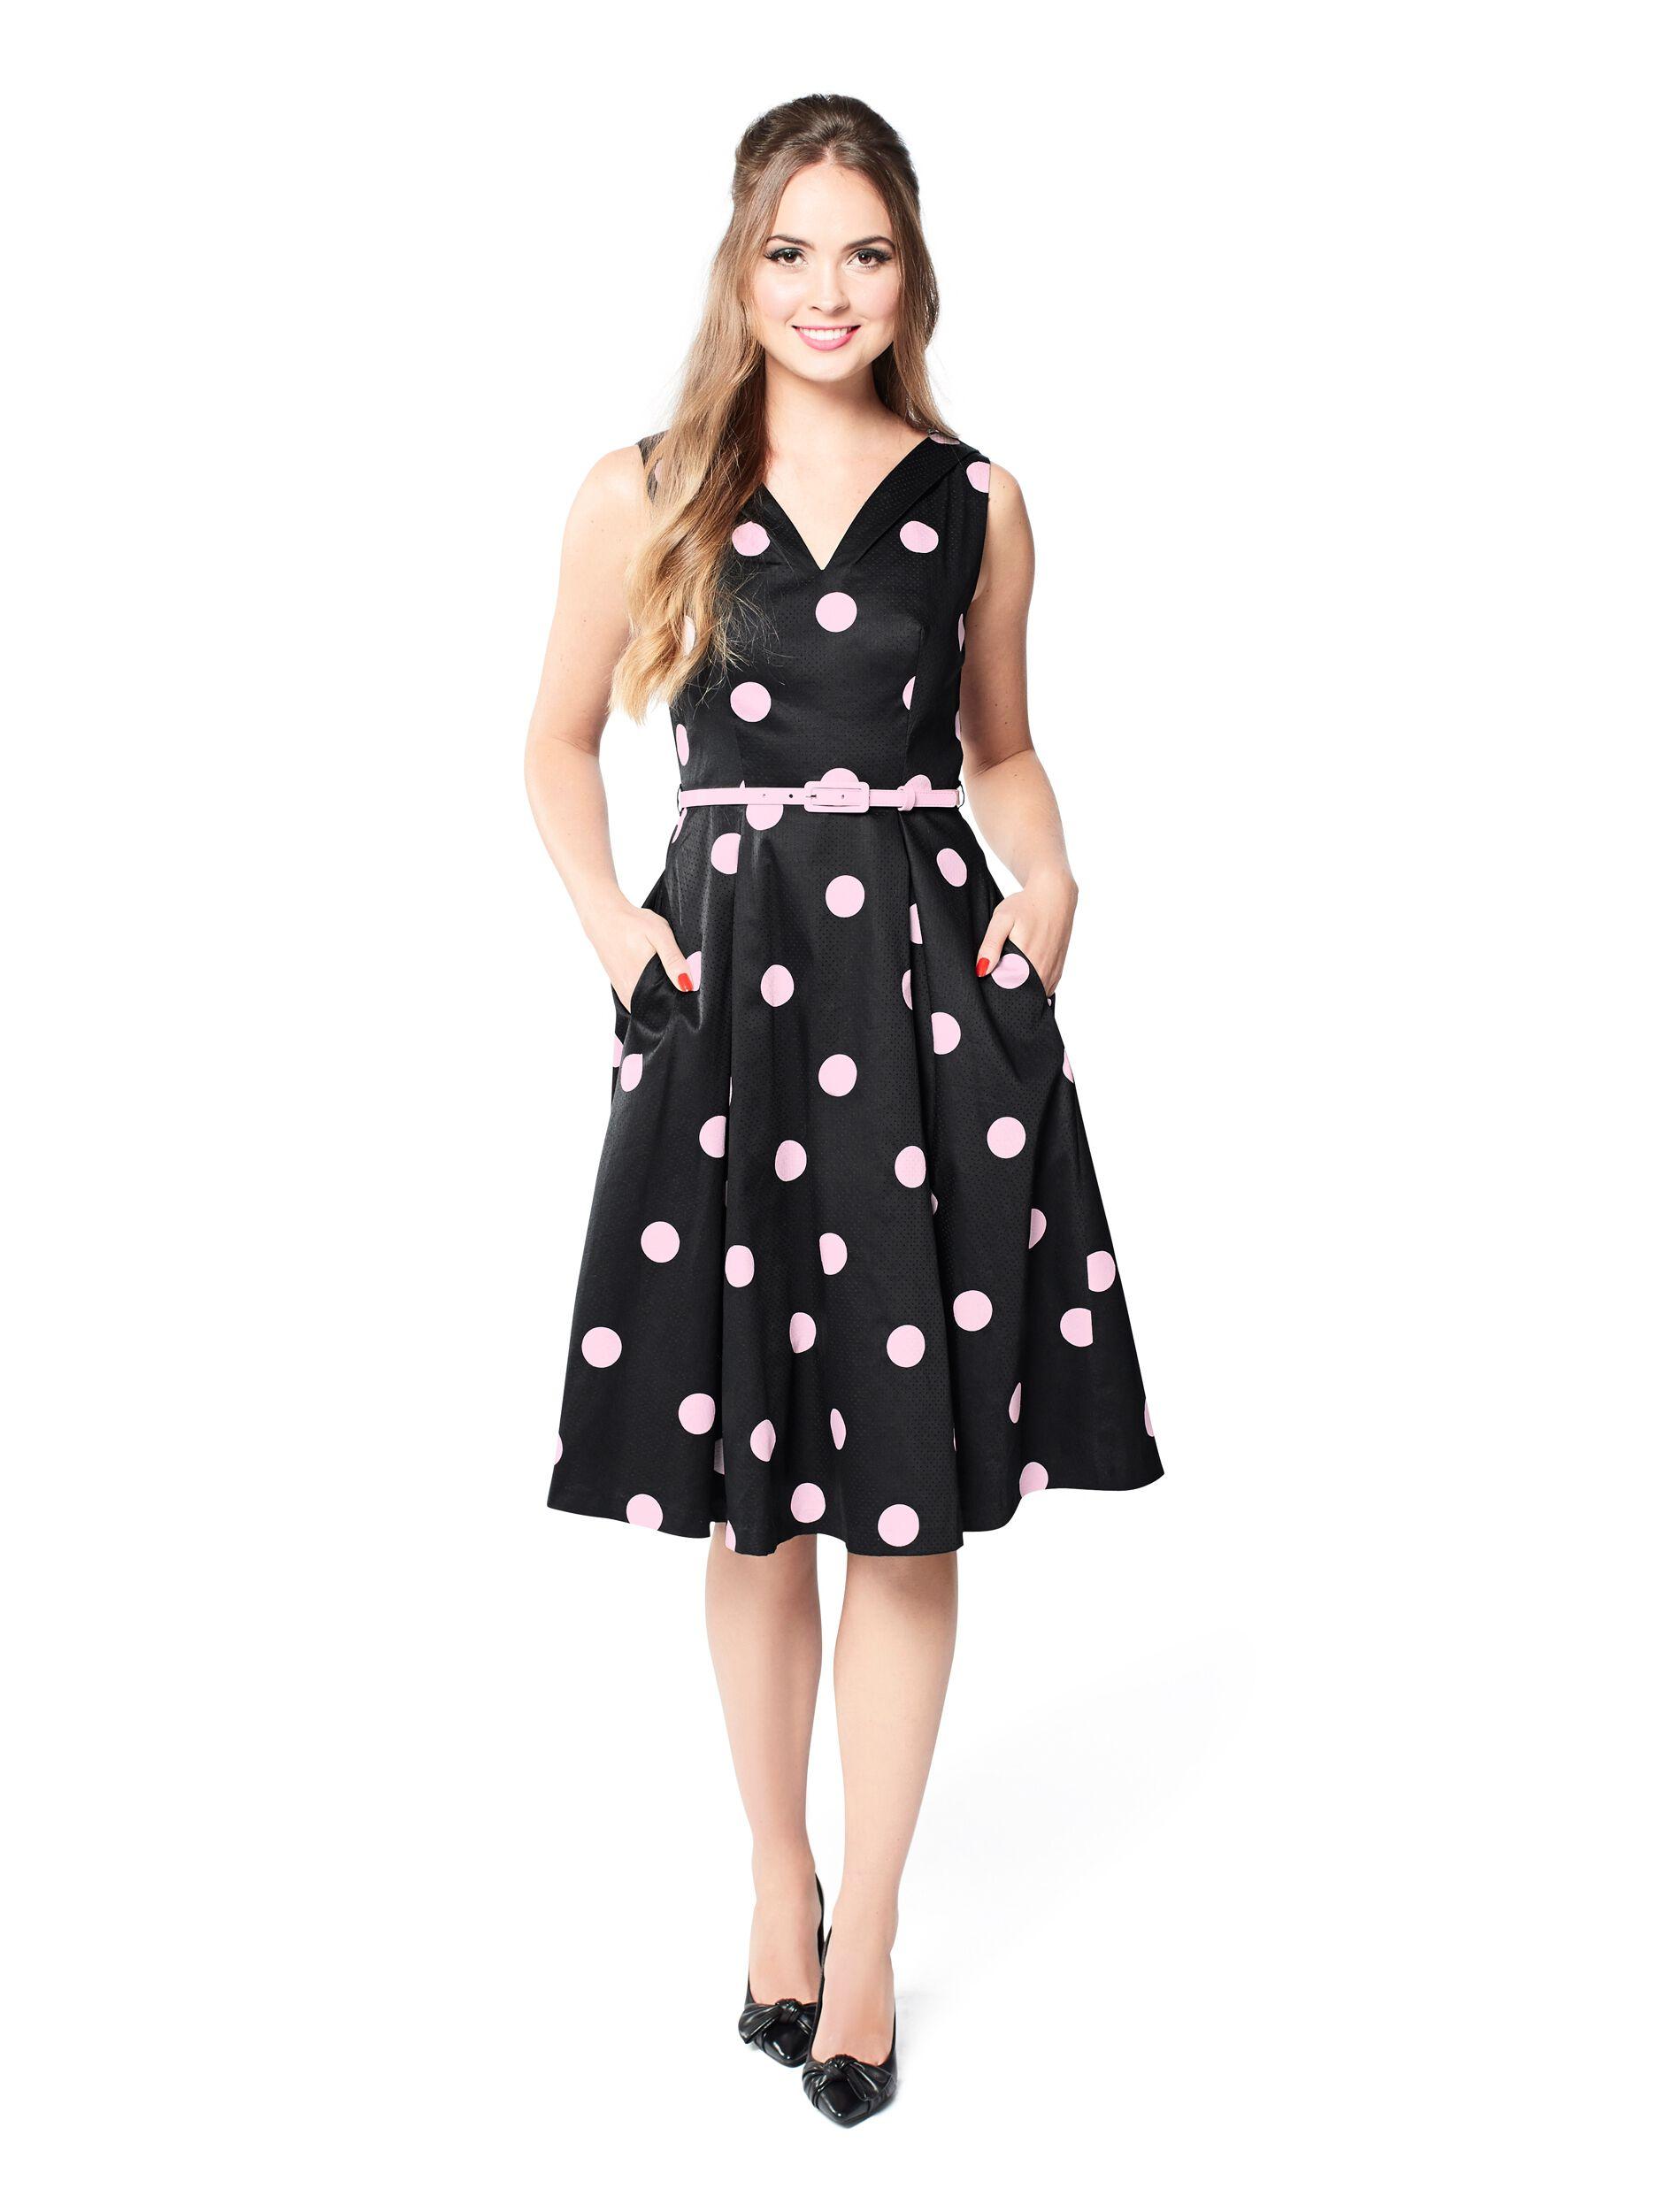 Fun Dress for Prom